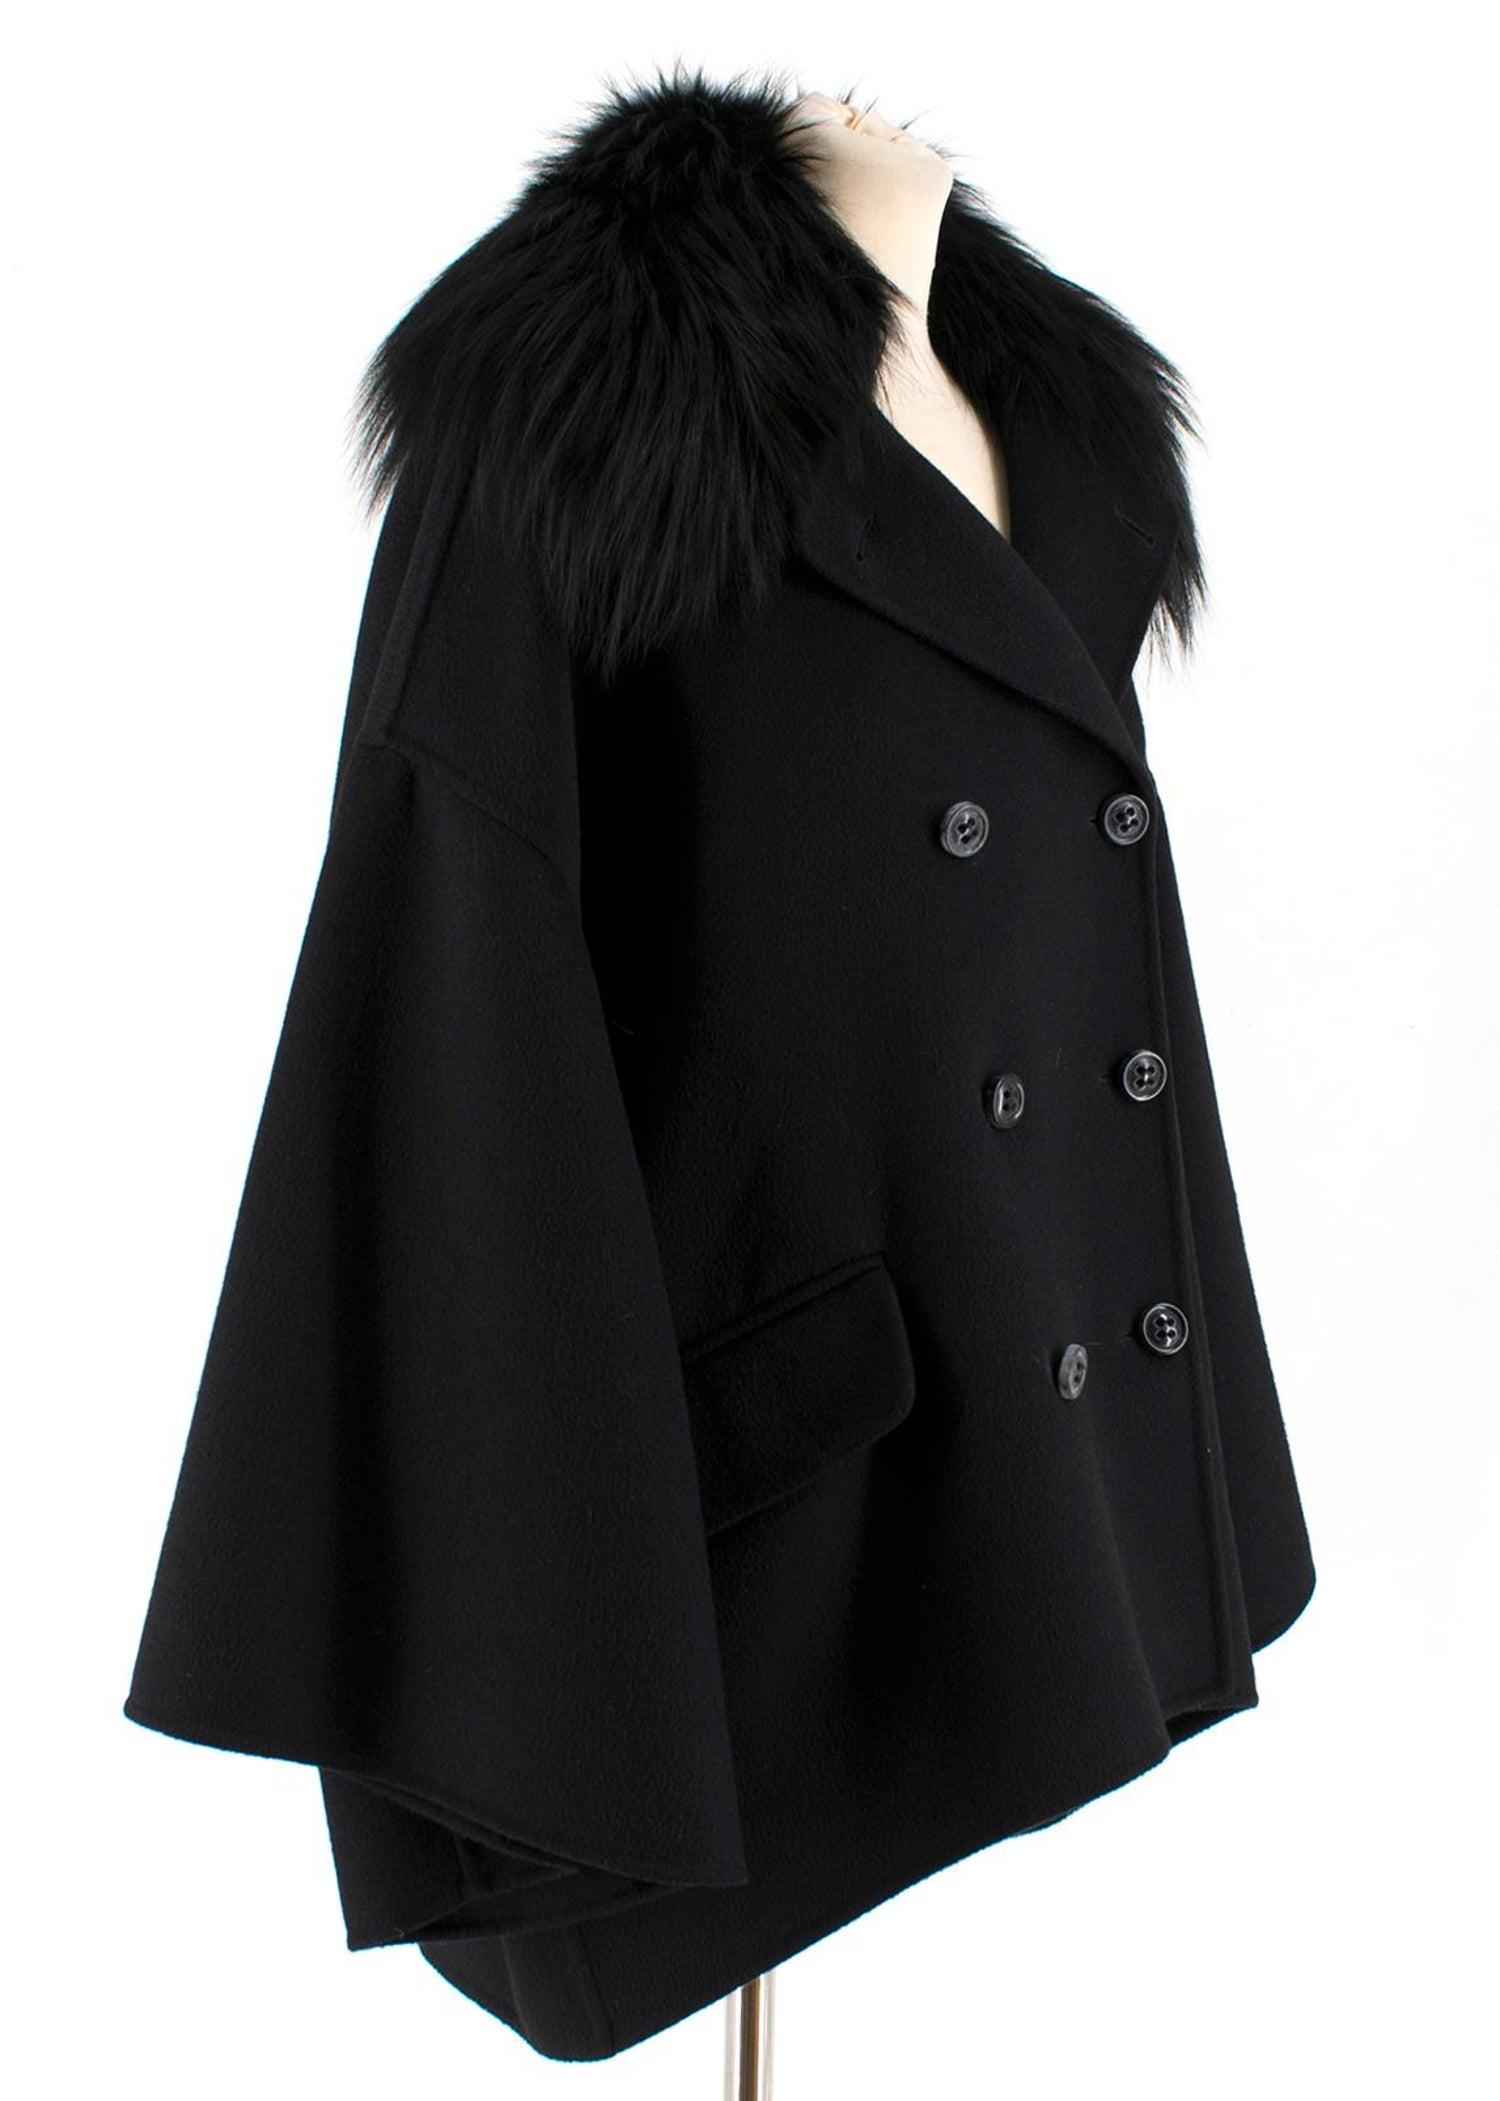 2bbe1c8f85152 Salvatore Ferragamo Black Cashmere Coat with Fox Fur Collar IT 42 For Sale  at 1stdibs